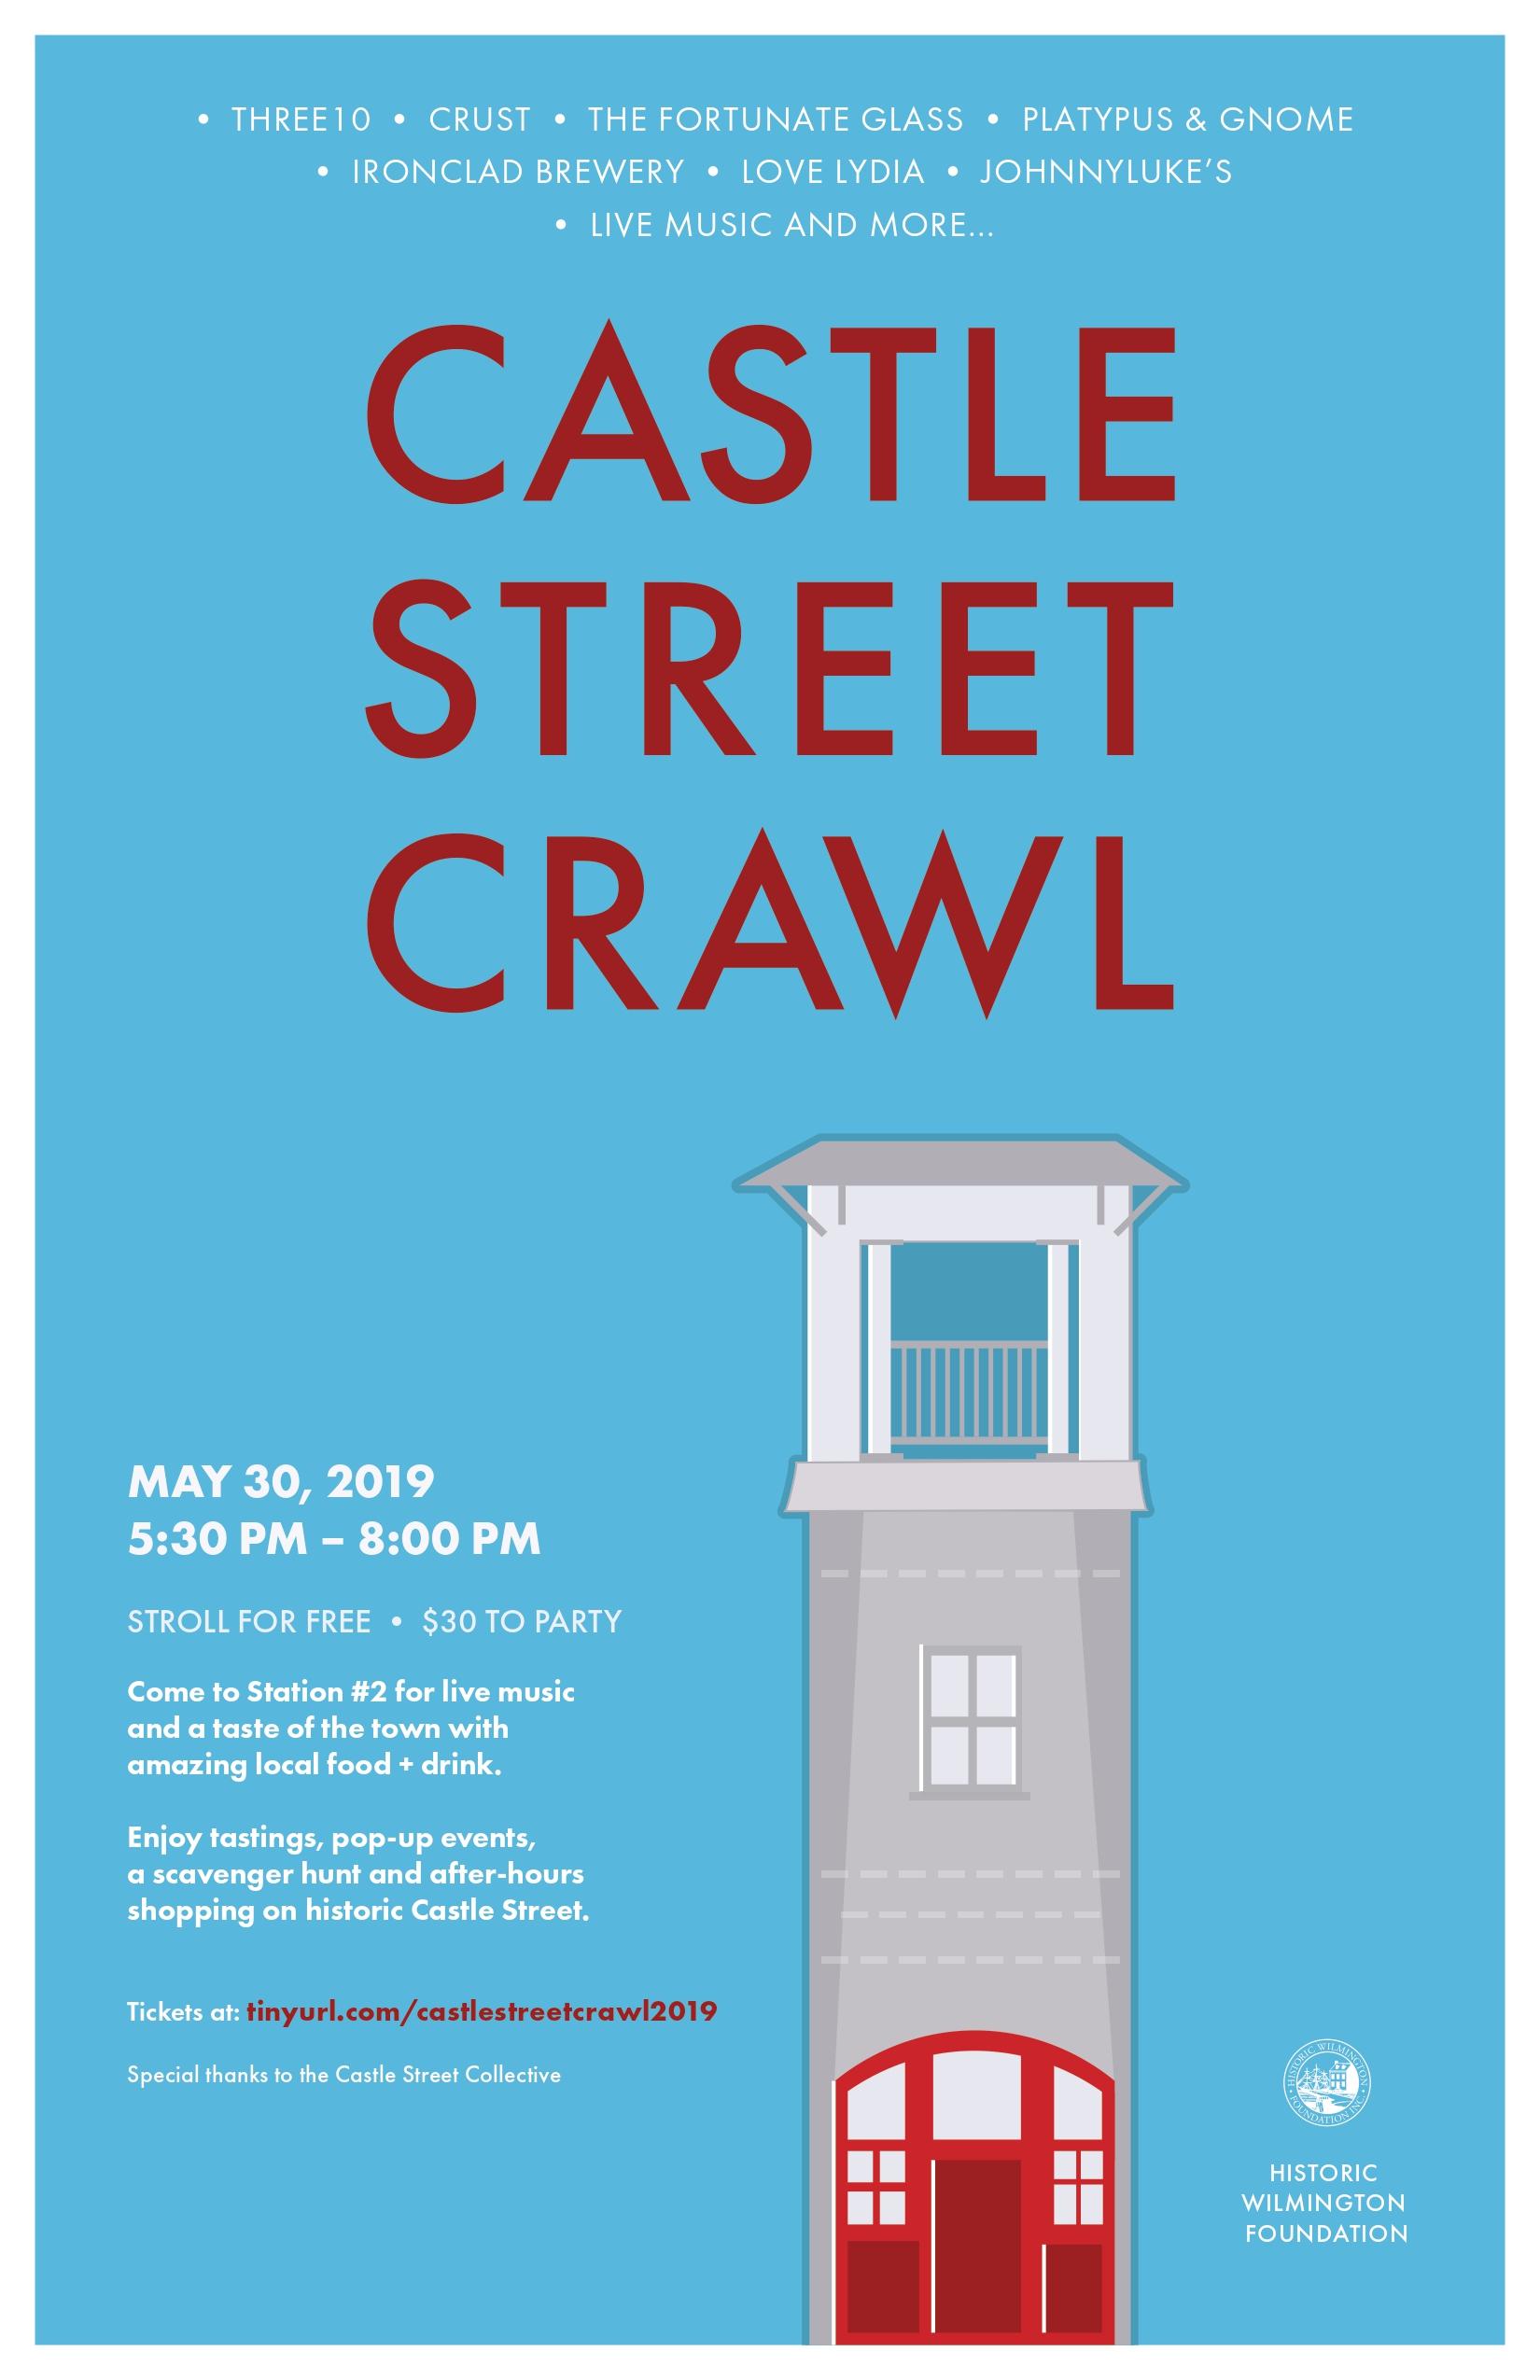 Castle Street Crawl - Historic Wilmington Foundation